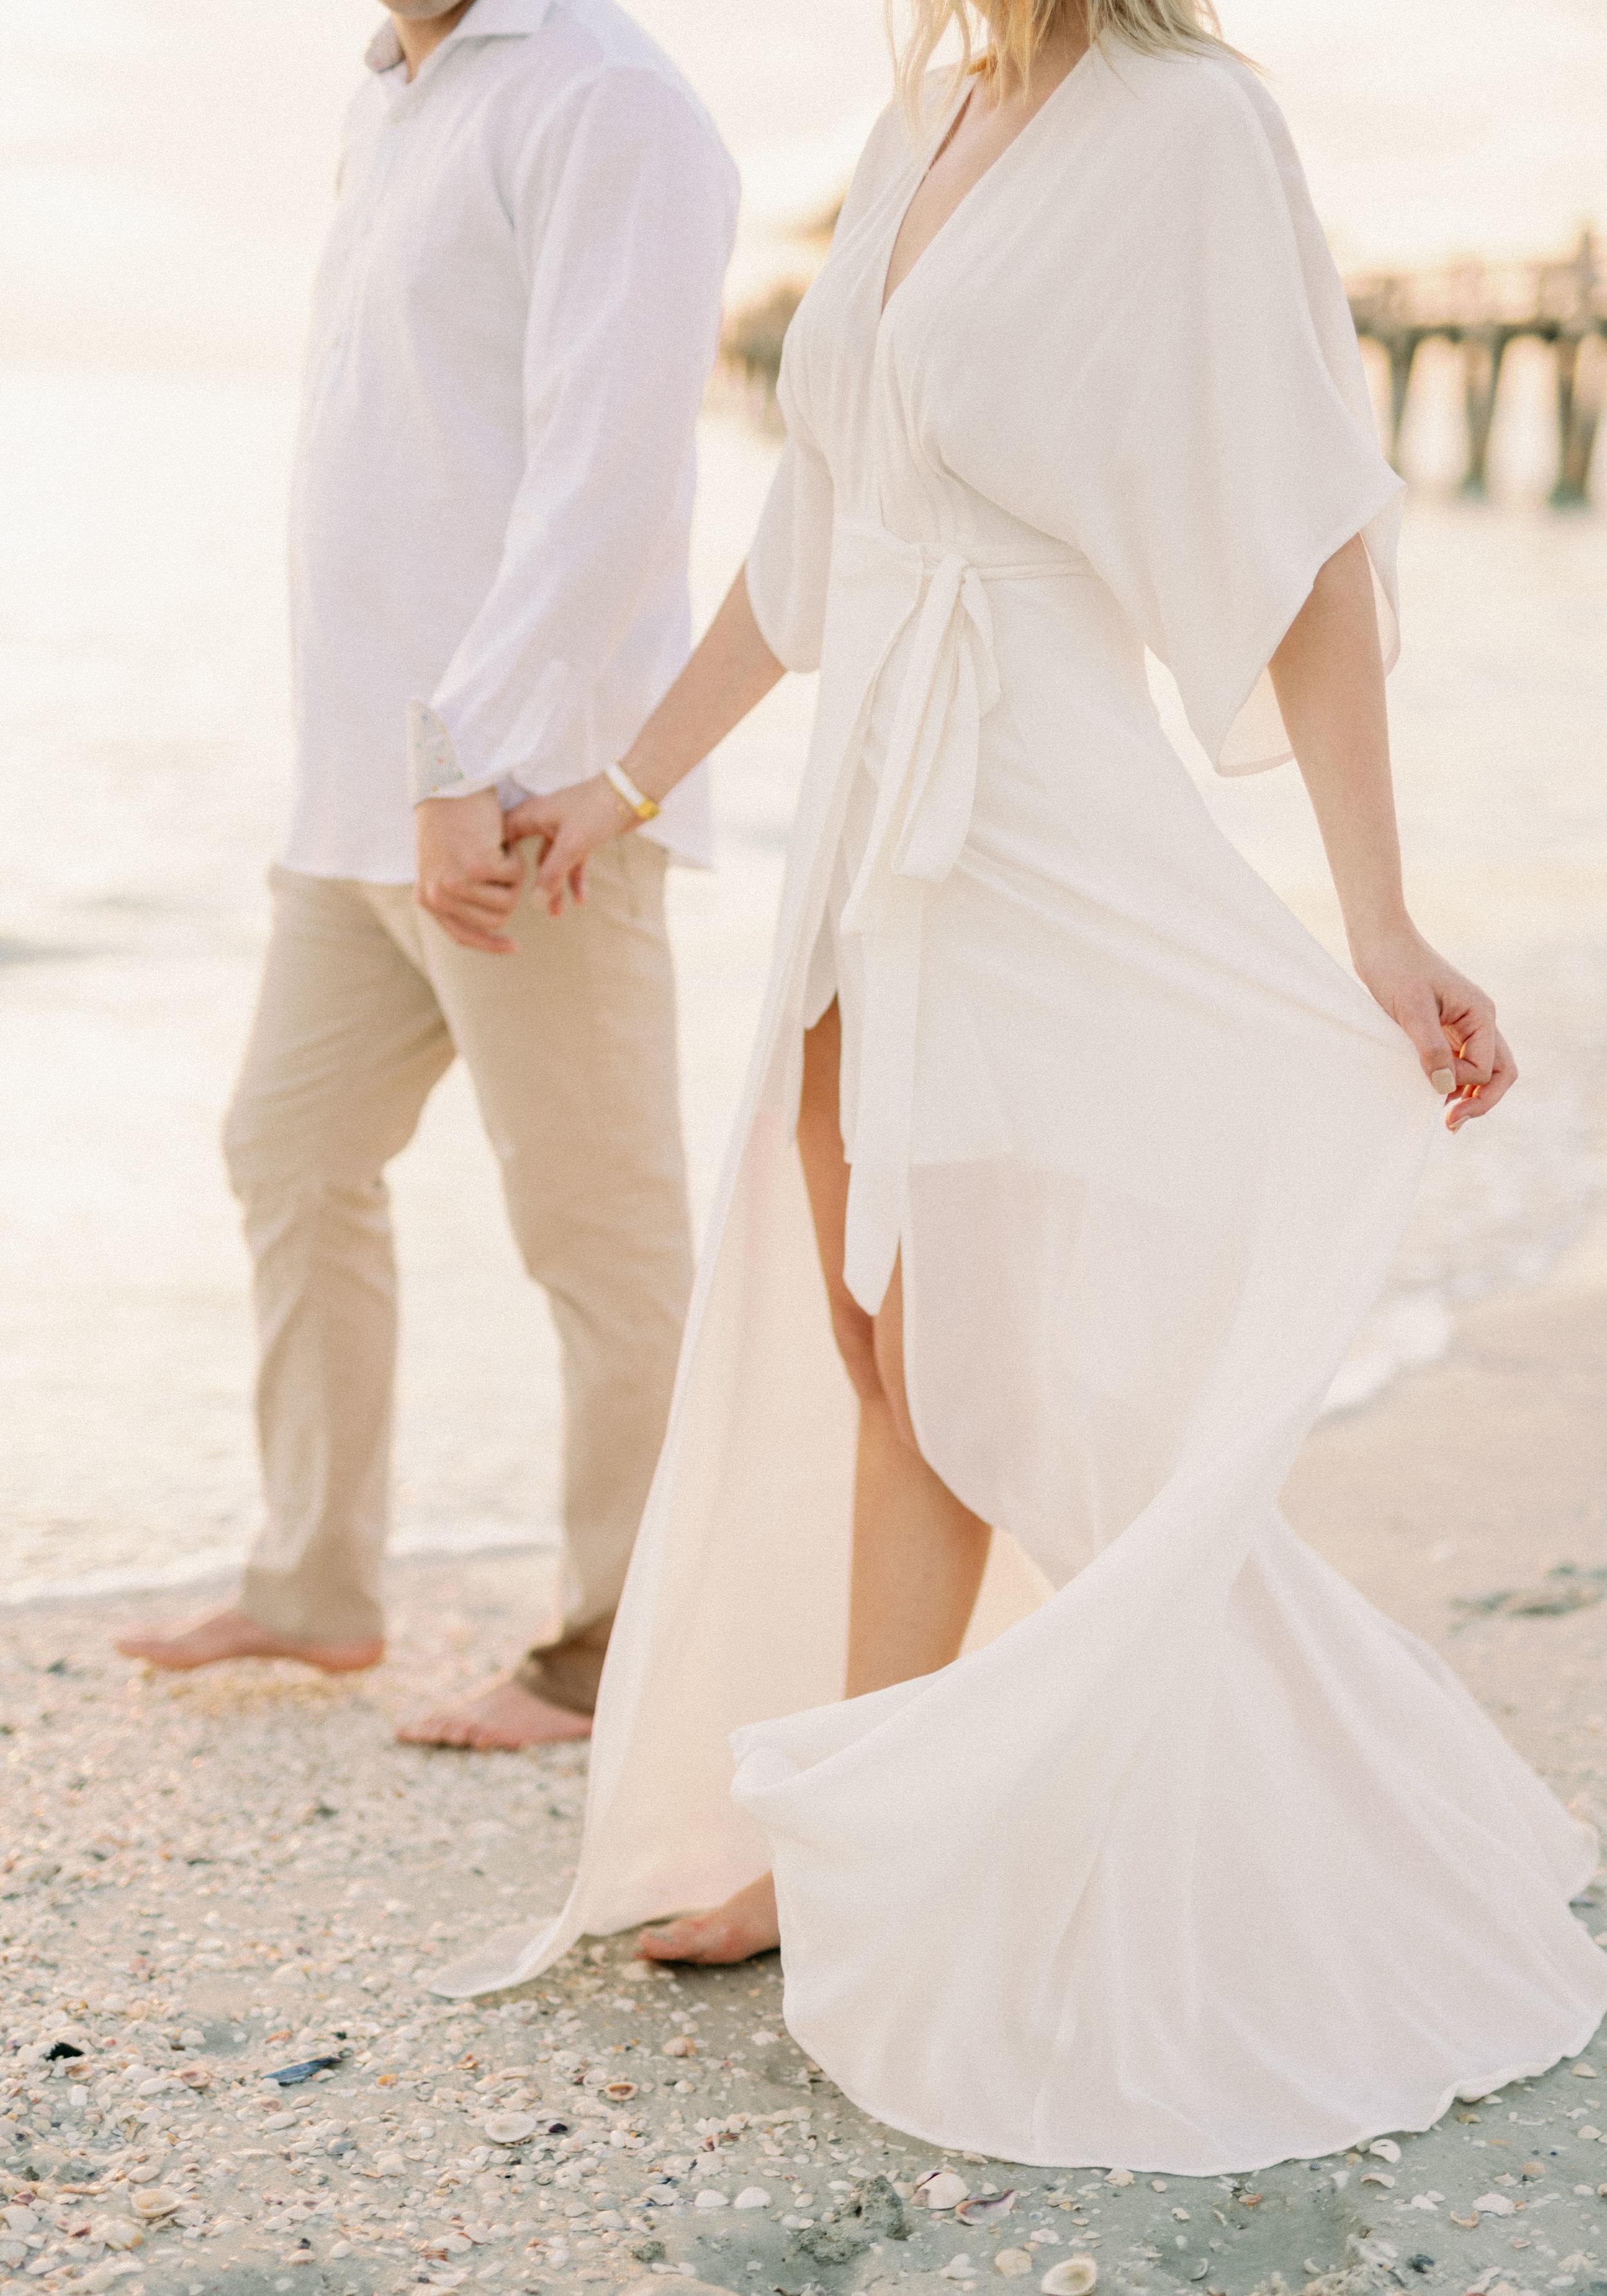 southwest florida fine art weddings